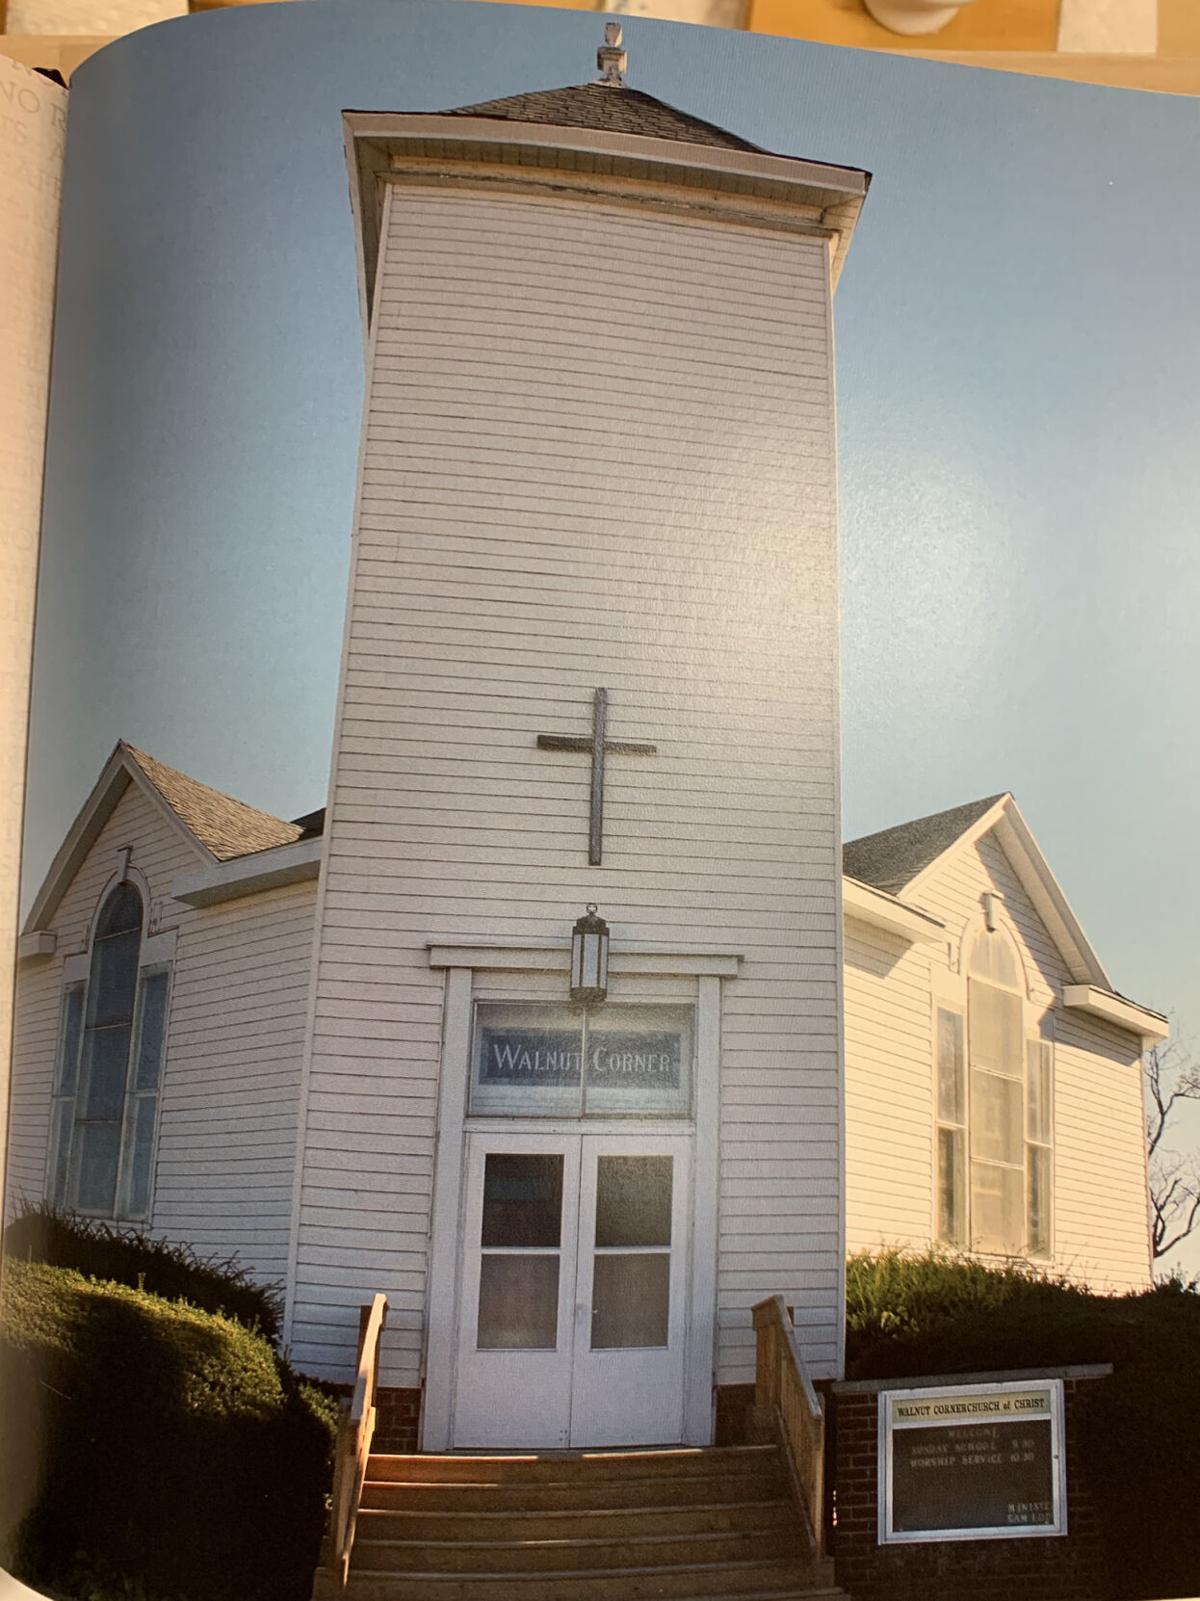 Church has long history